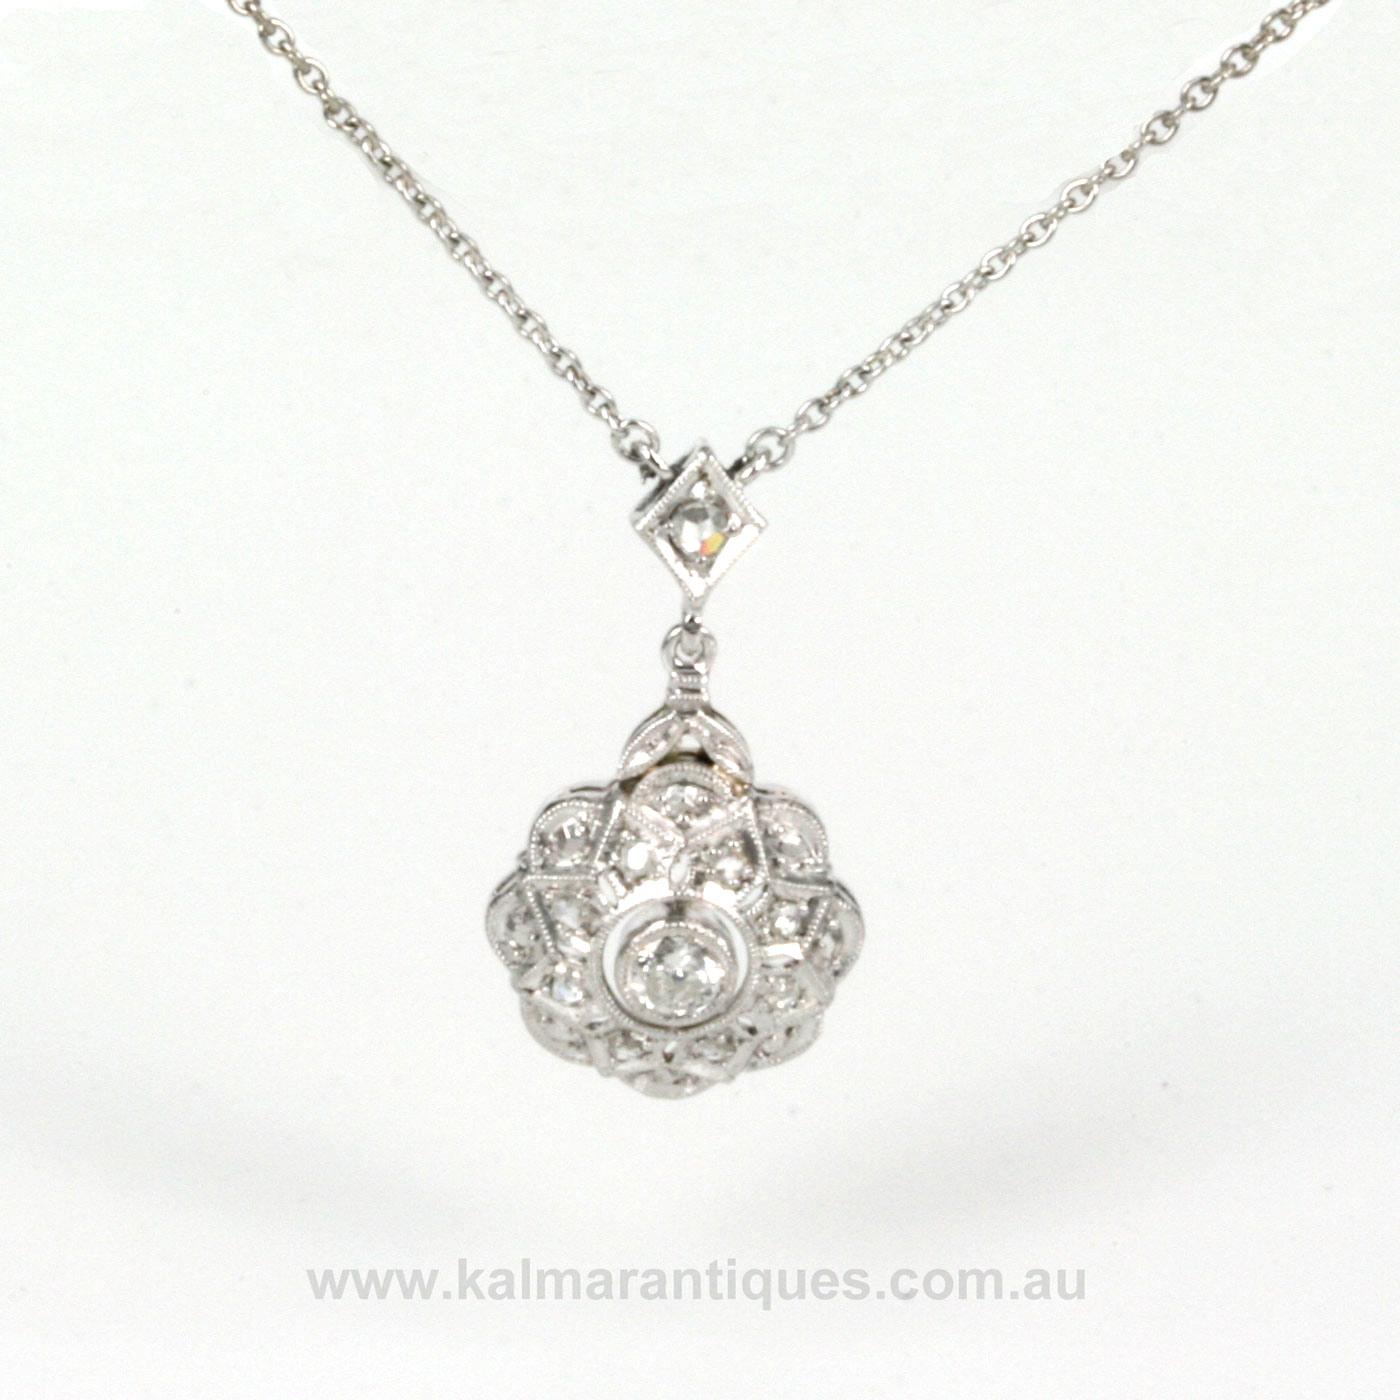 Buy 1920s art deco diamond pendant sold items sold jewellery 1920s art deco diamond pendant aloadofball Images